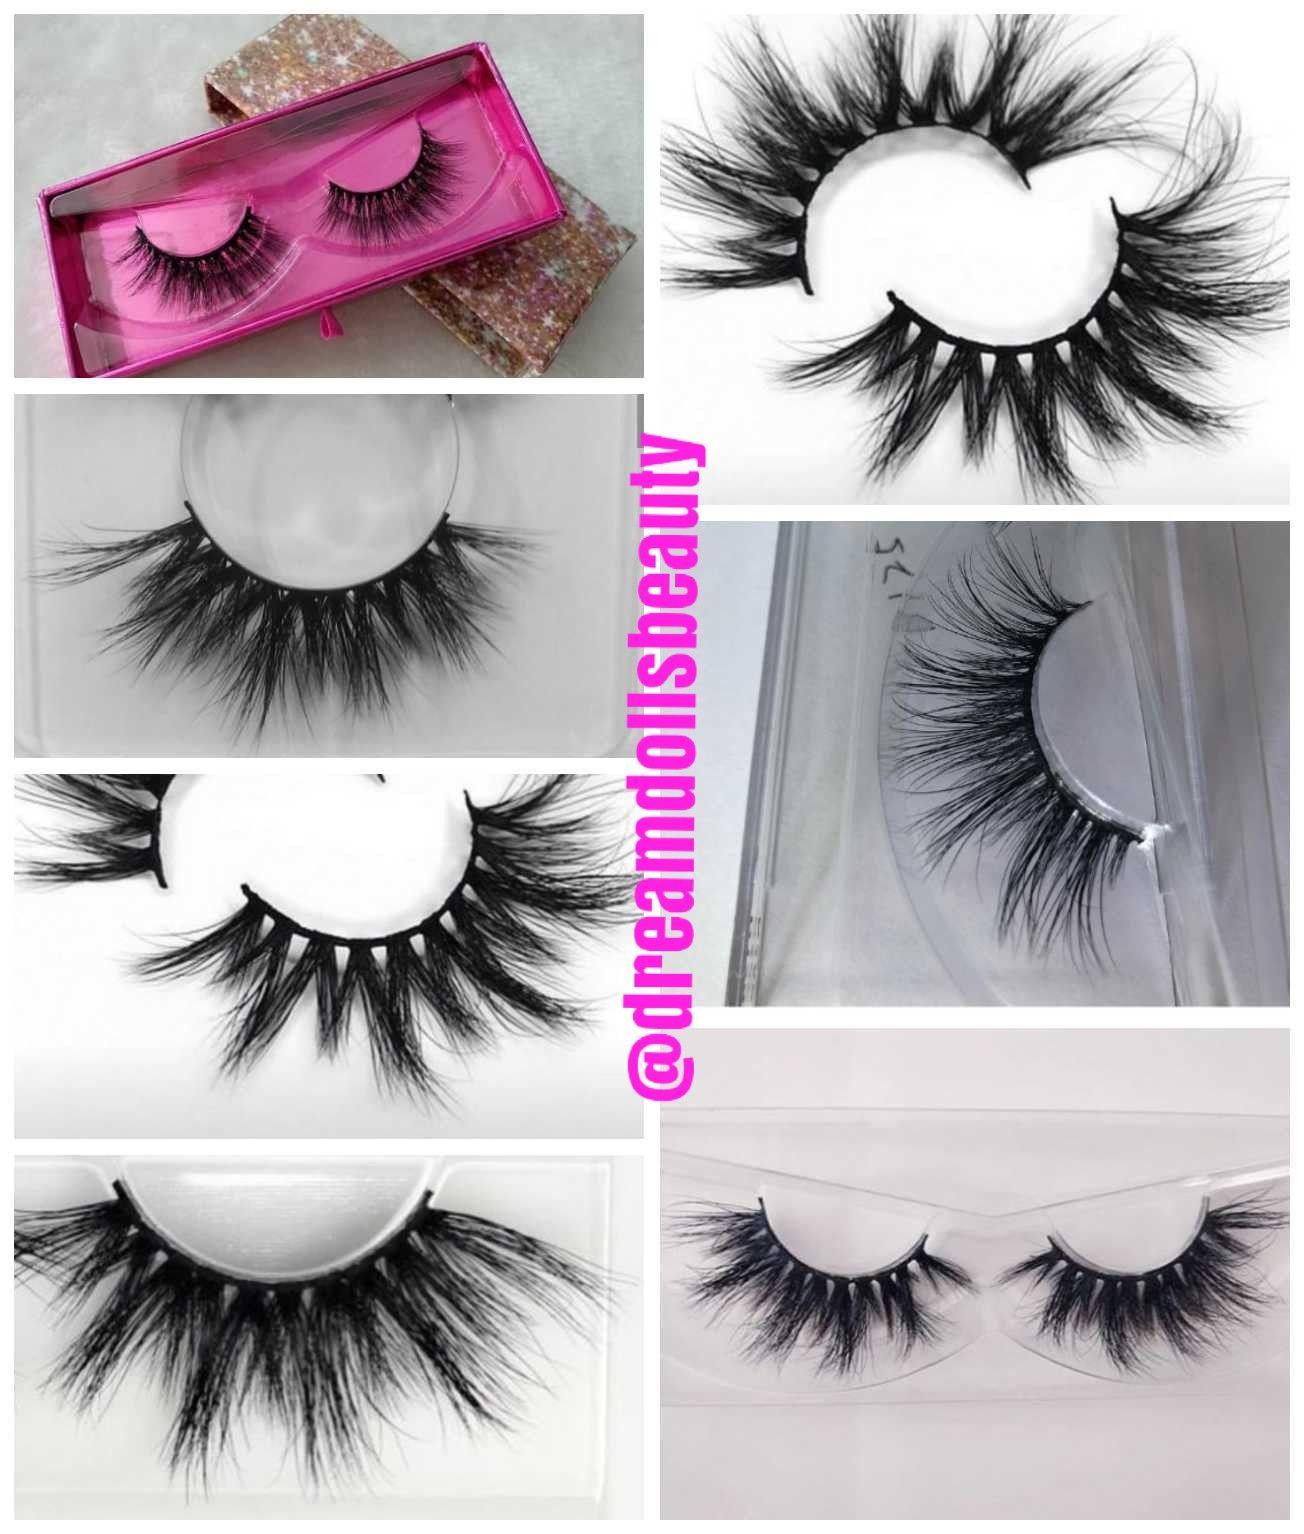 8d346c79c09 5D Mink Lashes on Sale @ www.dreamdollsbeauty.com | Lashes ...